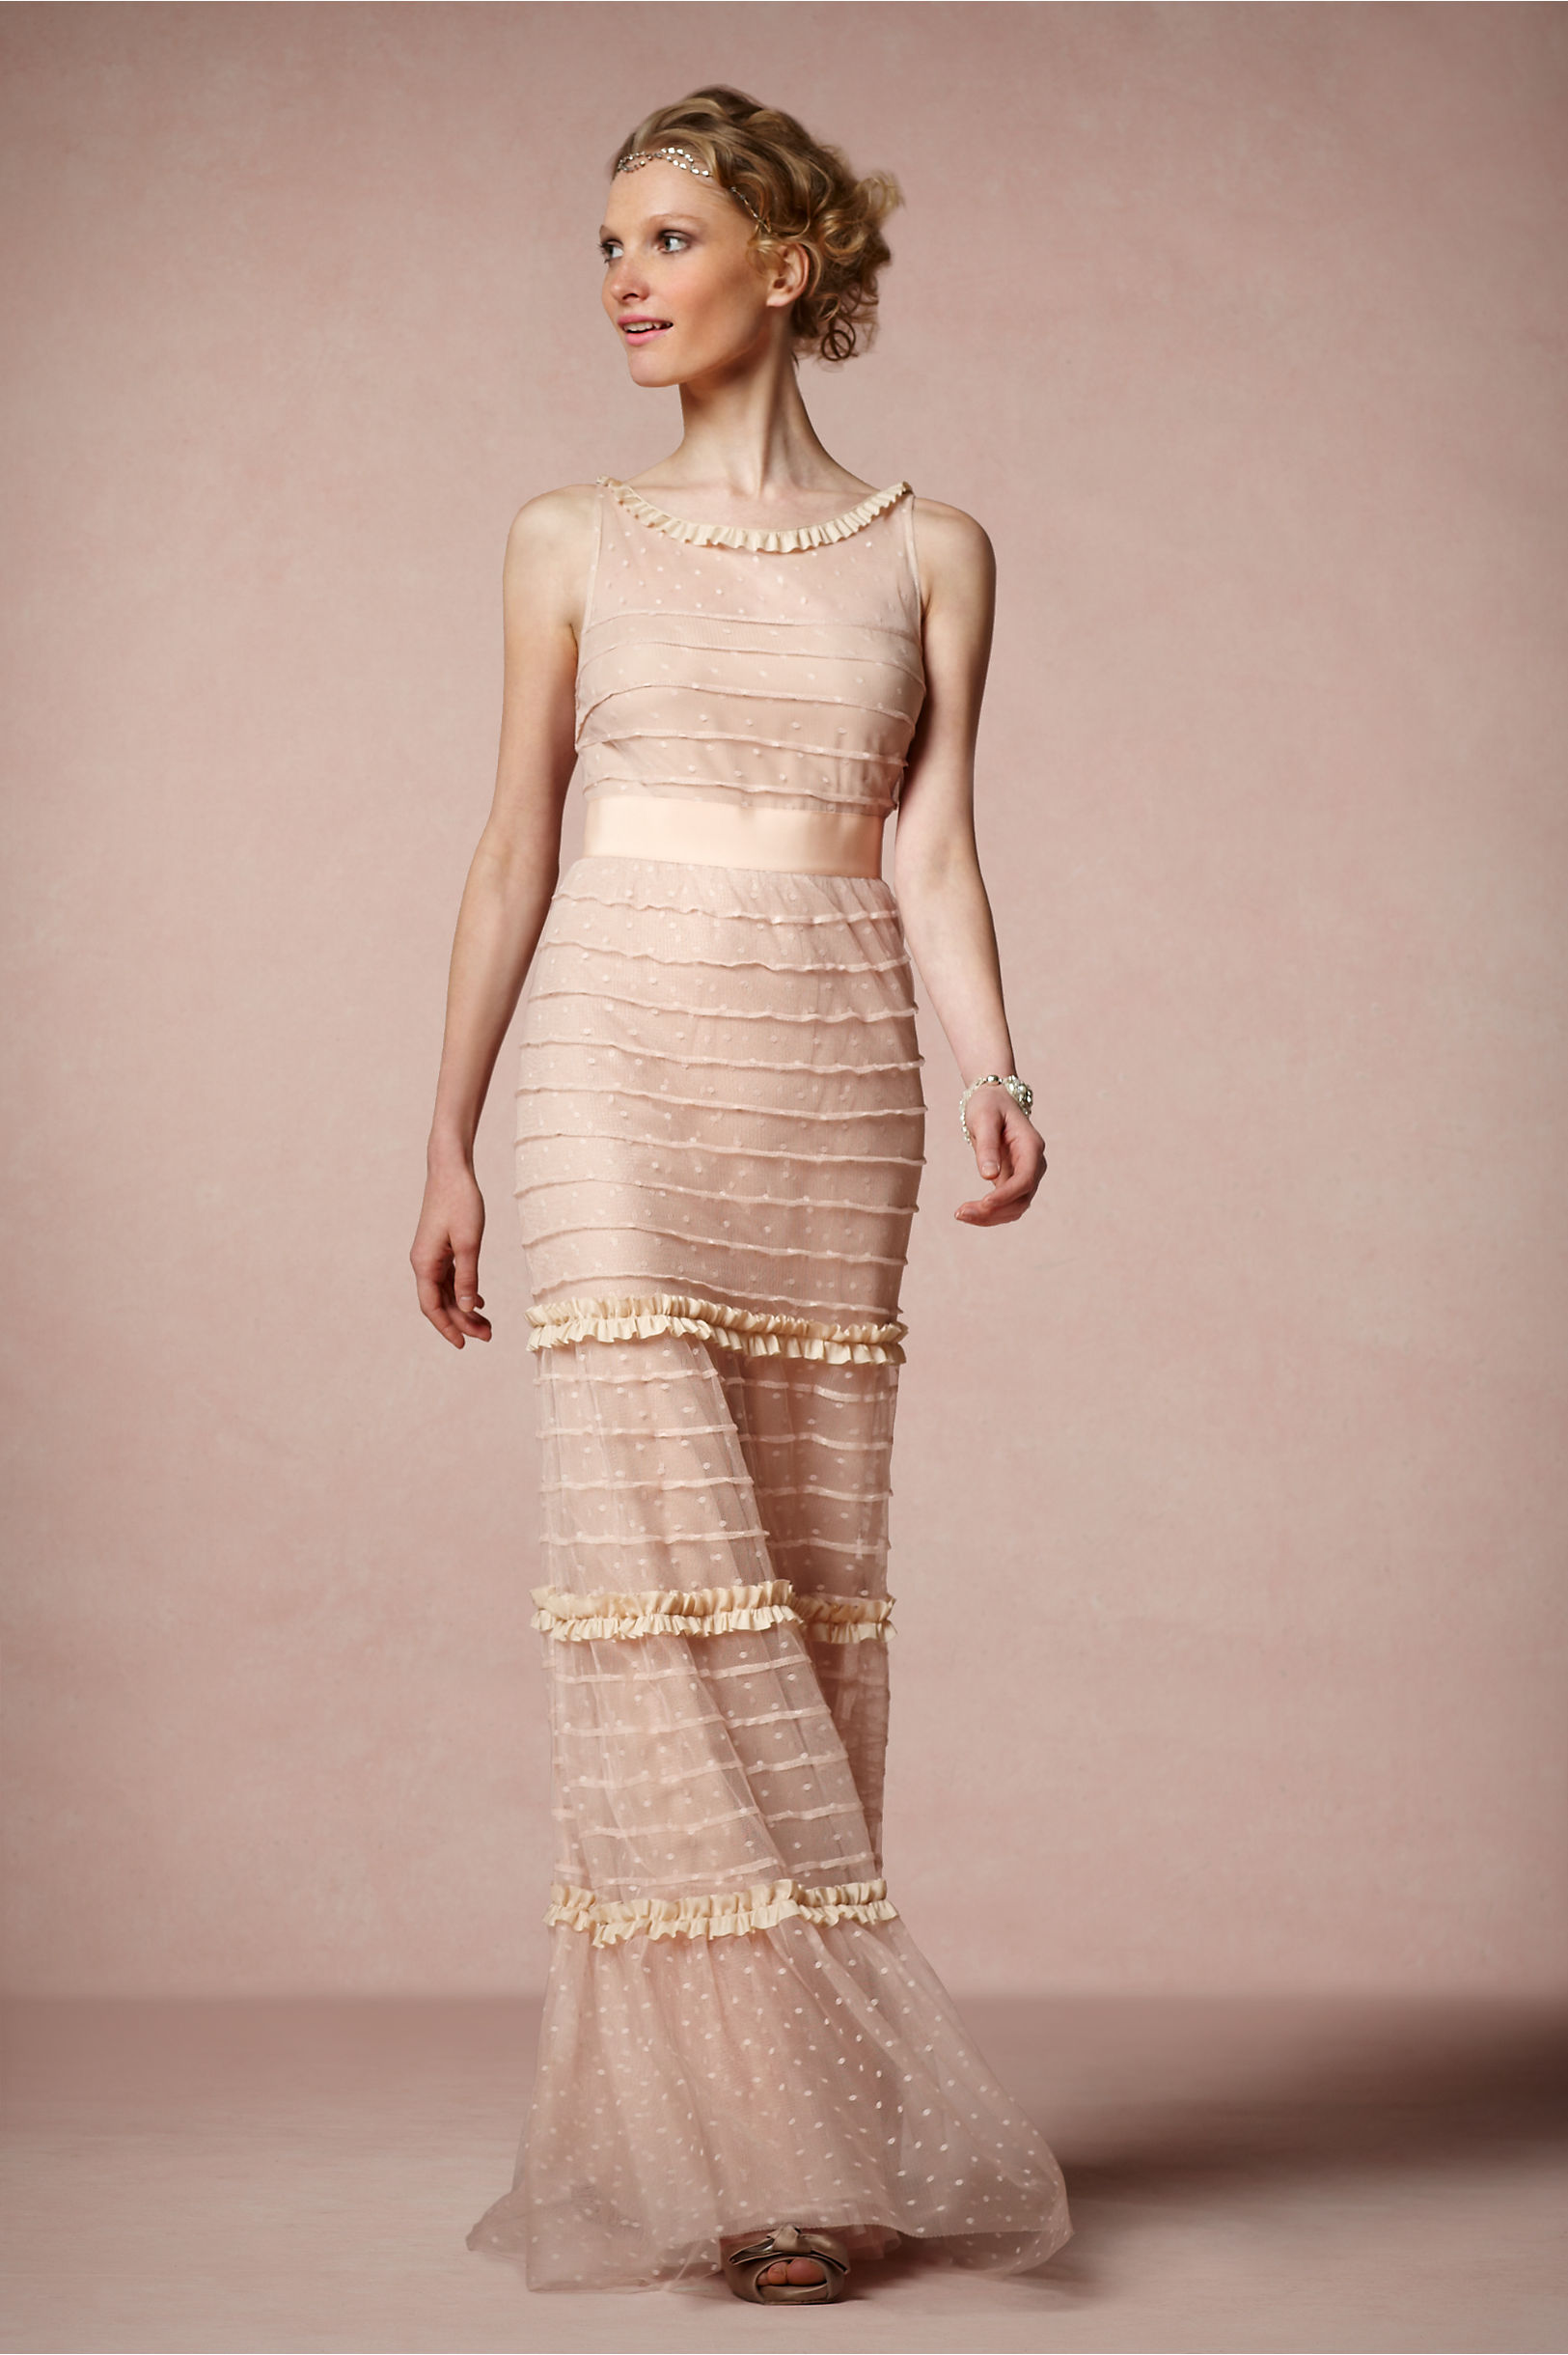 Swansdown Dress in Bridal Party | BHLDN